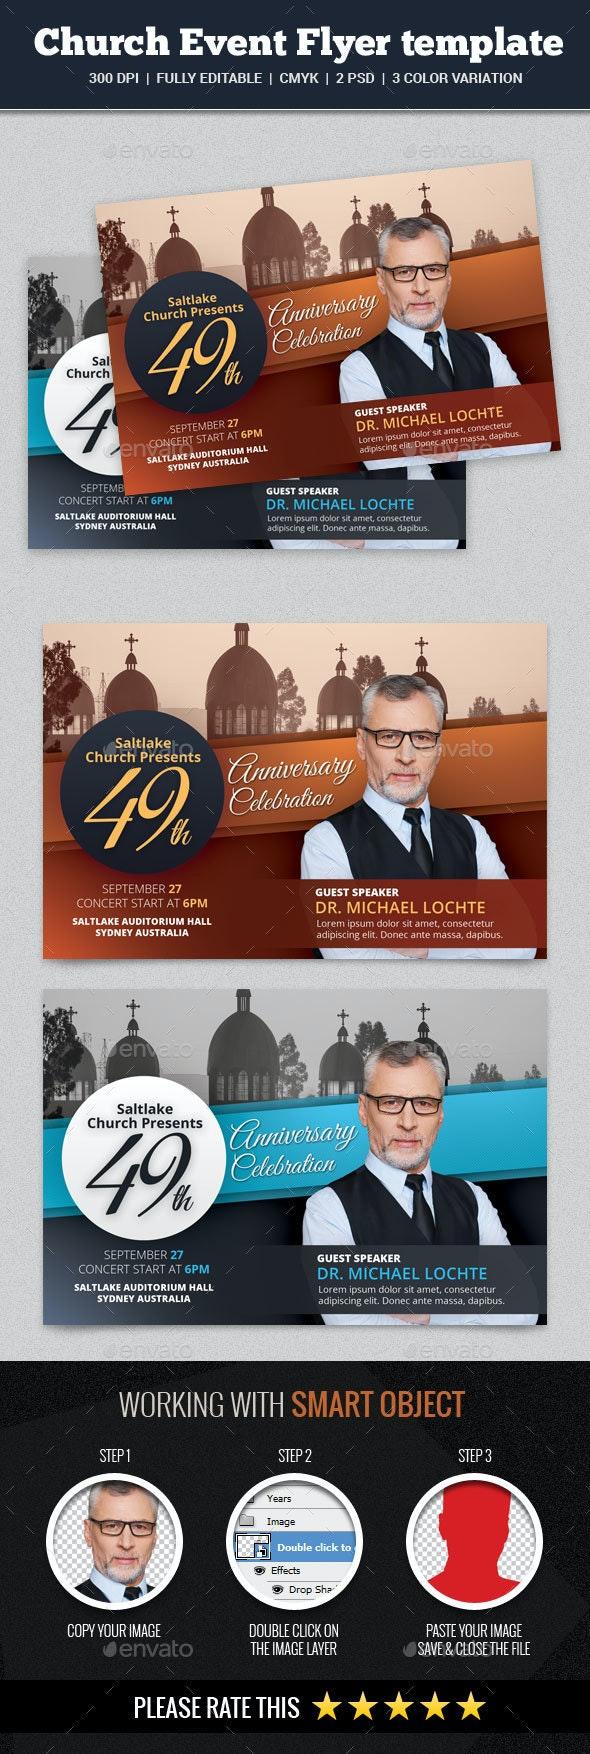 Church Event Flyer - Church Flyers